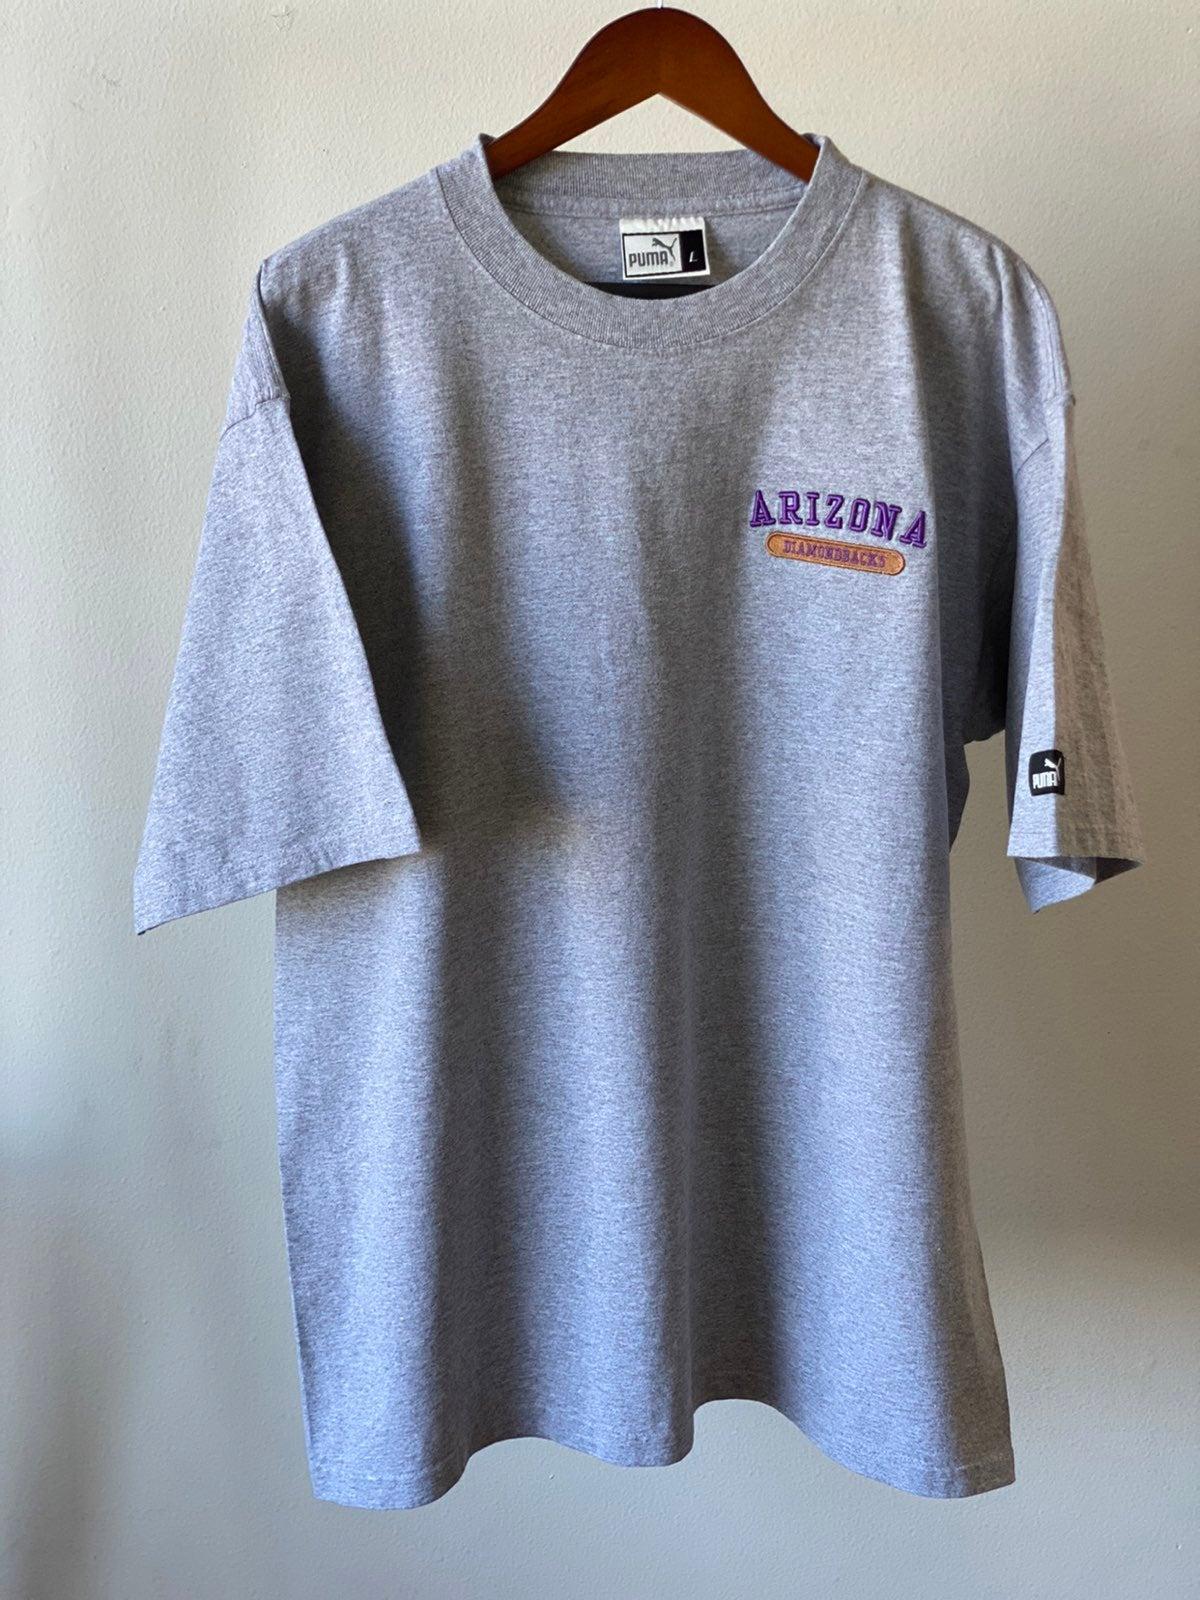 Vintage Puma Arizona Diamondbacks Shirt